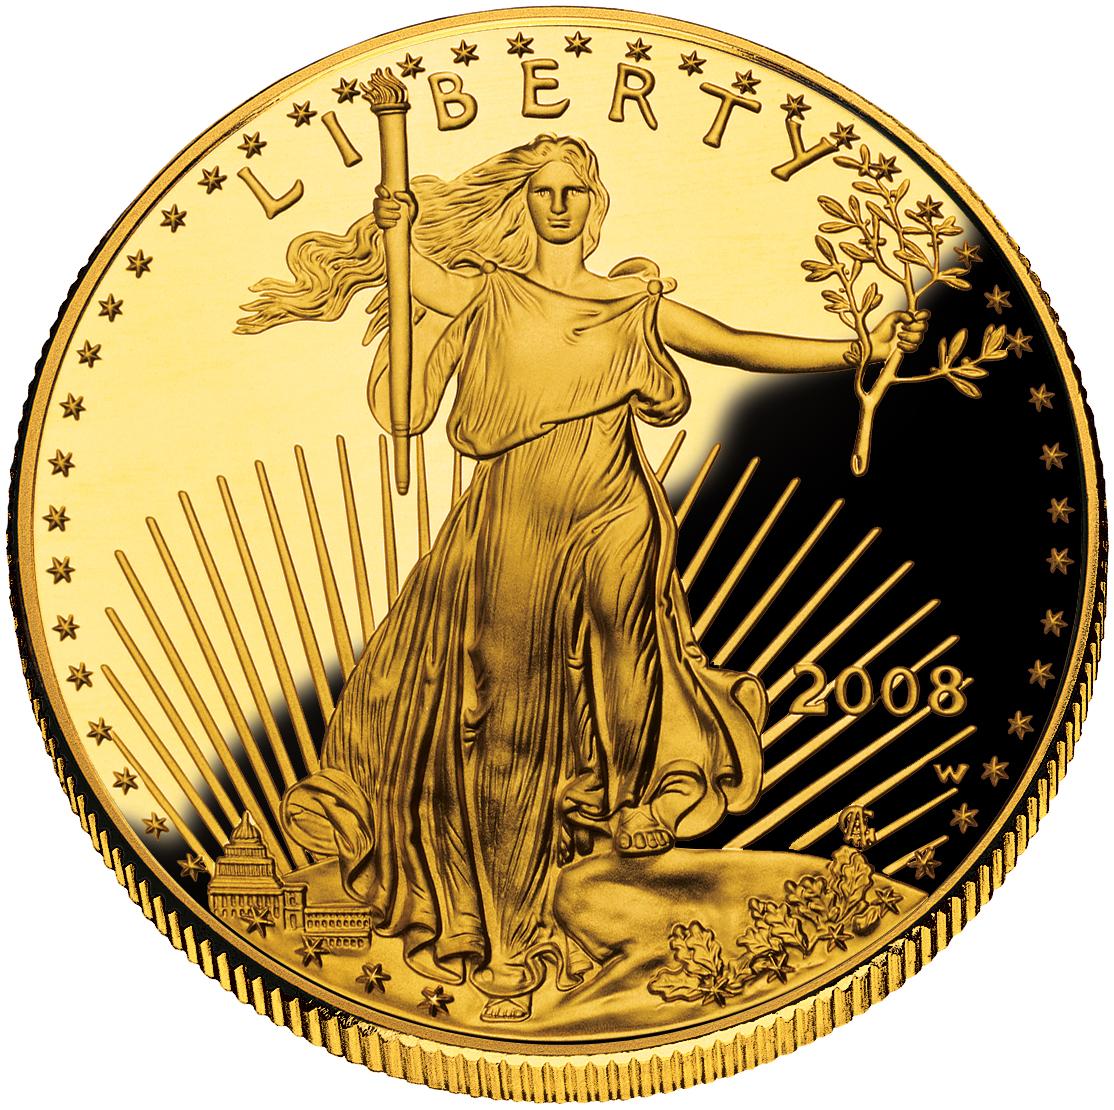 Gold Wallpaper Canada: Gold Coins Wallpaper